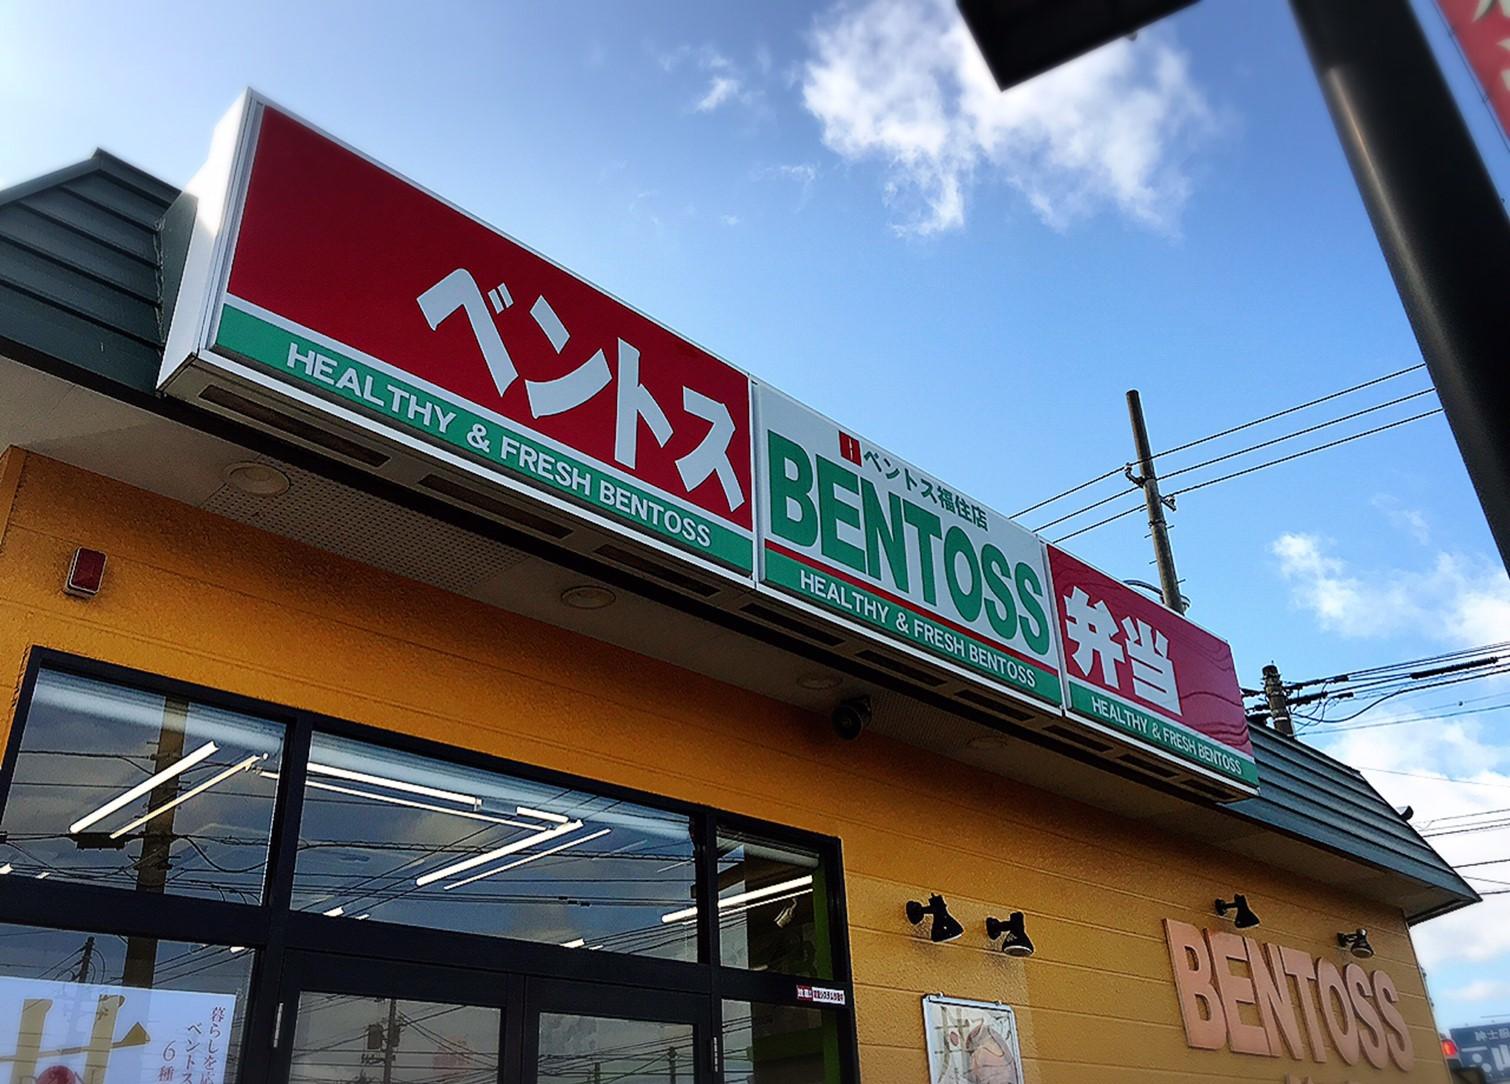 BENTOSS/札幌市 豊平区_c0378174_16284007.jpg